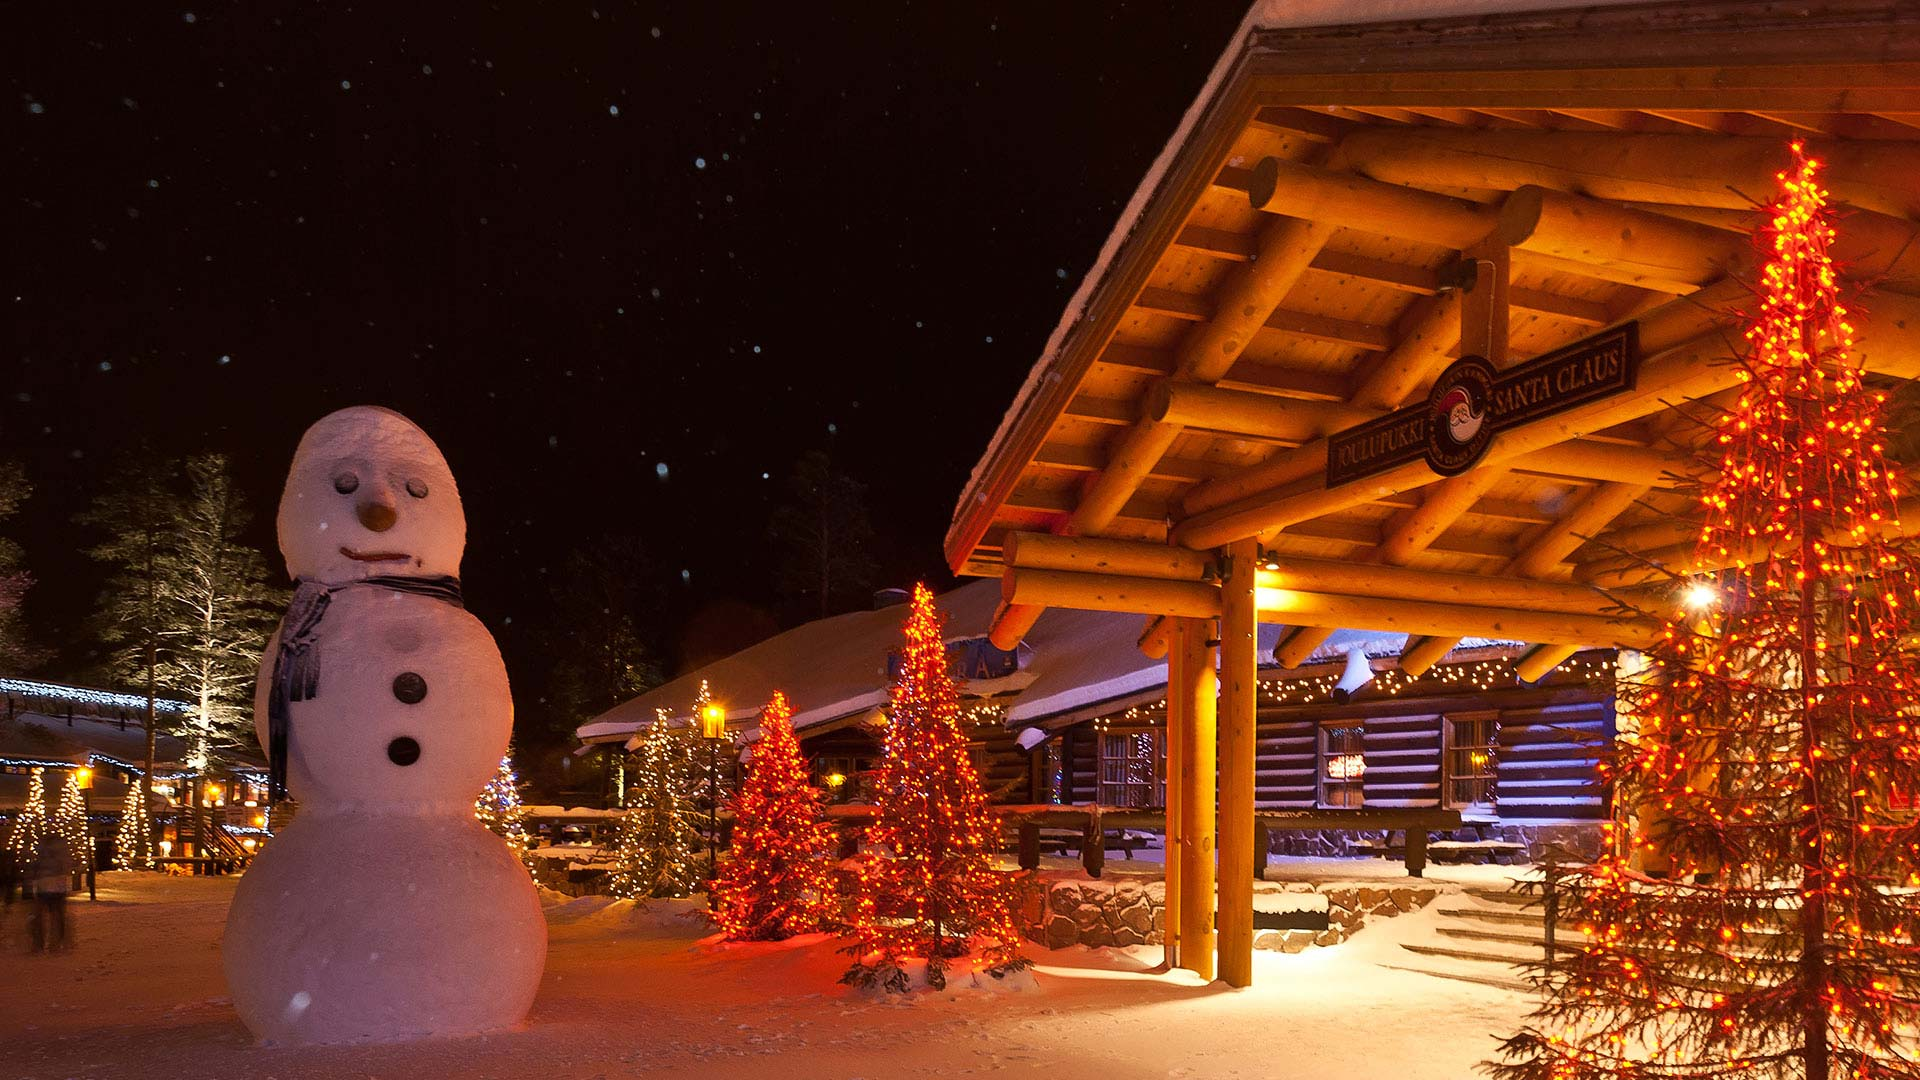 Santa Claus Village & Cabin Relaxation - 4 Days 3 Nights ...